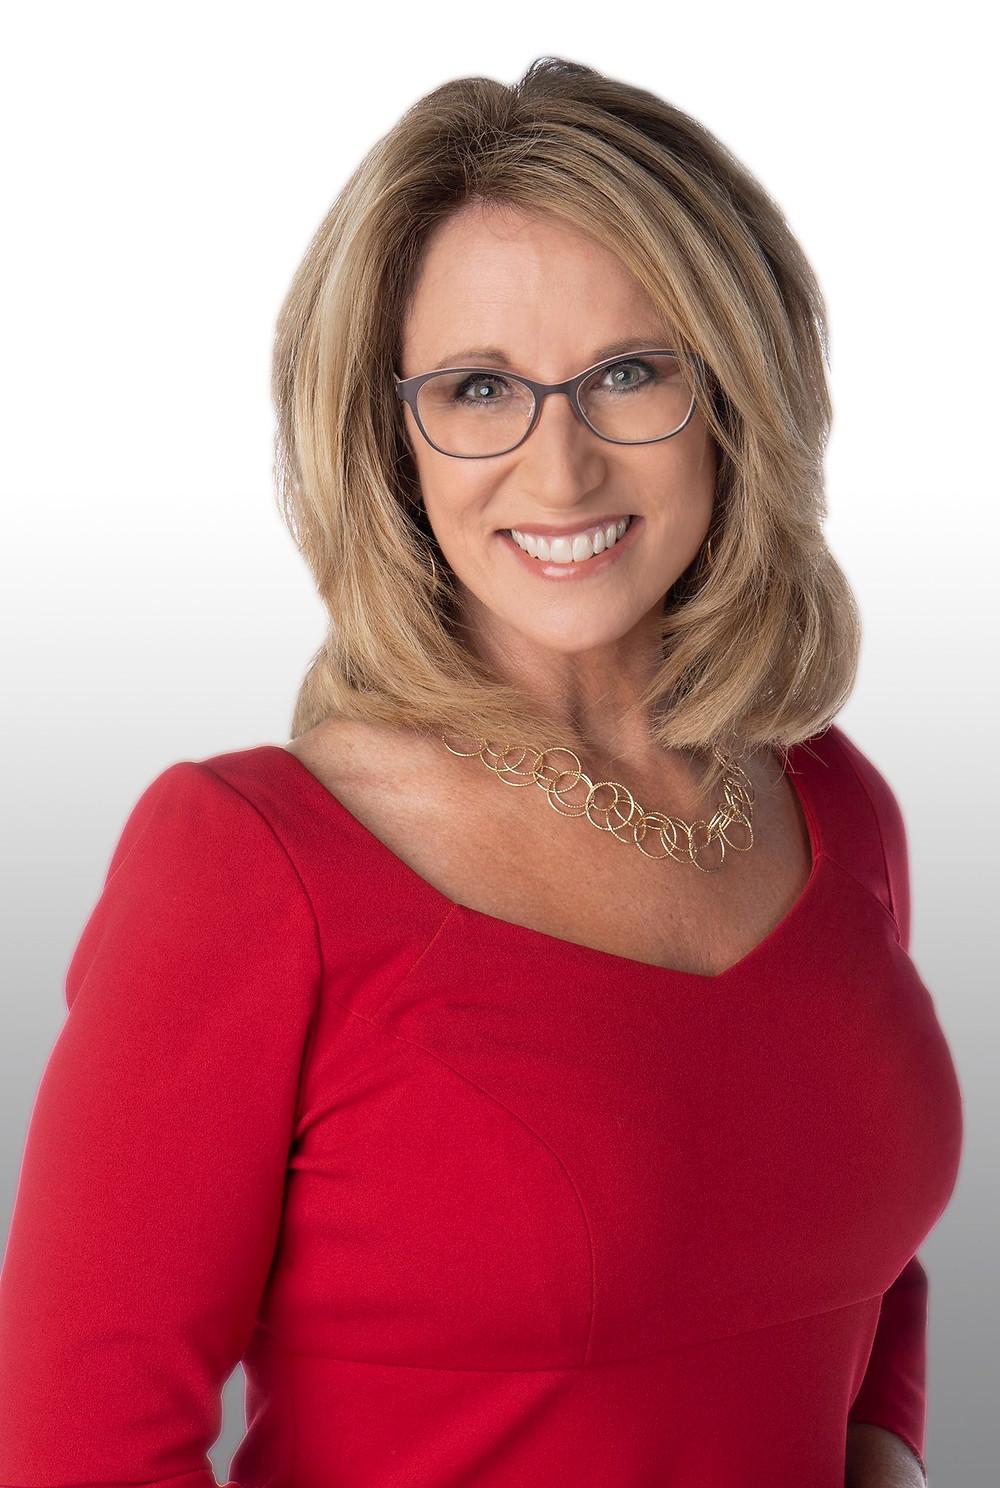 A photograph of Debra Morgan